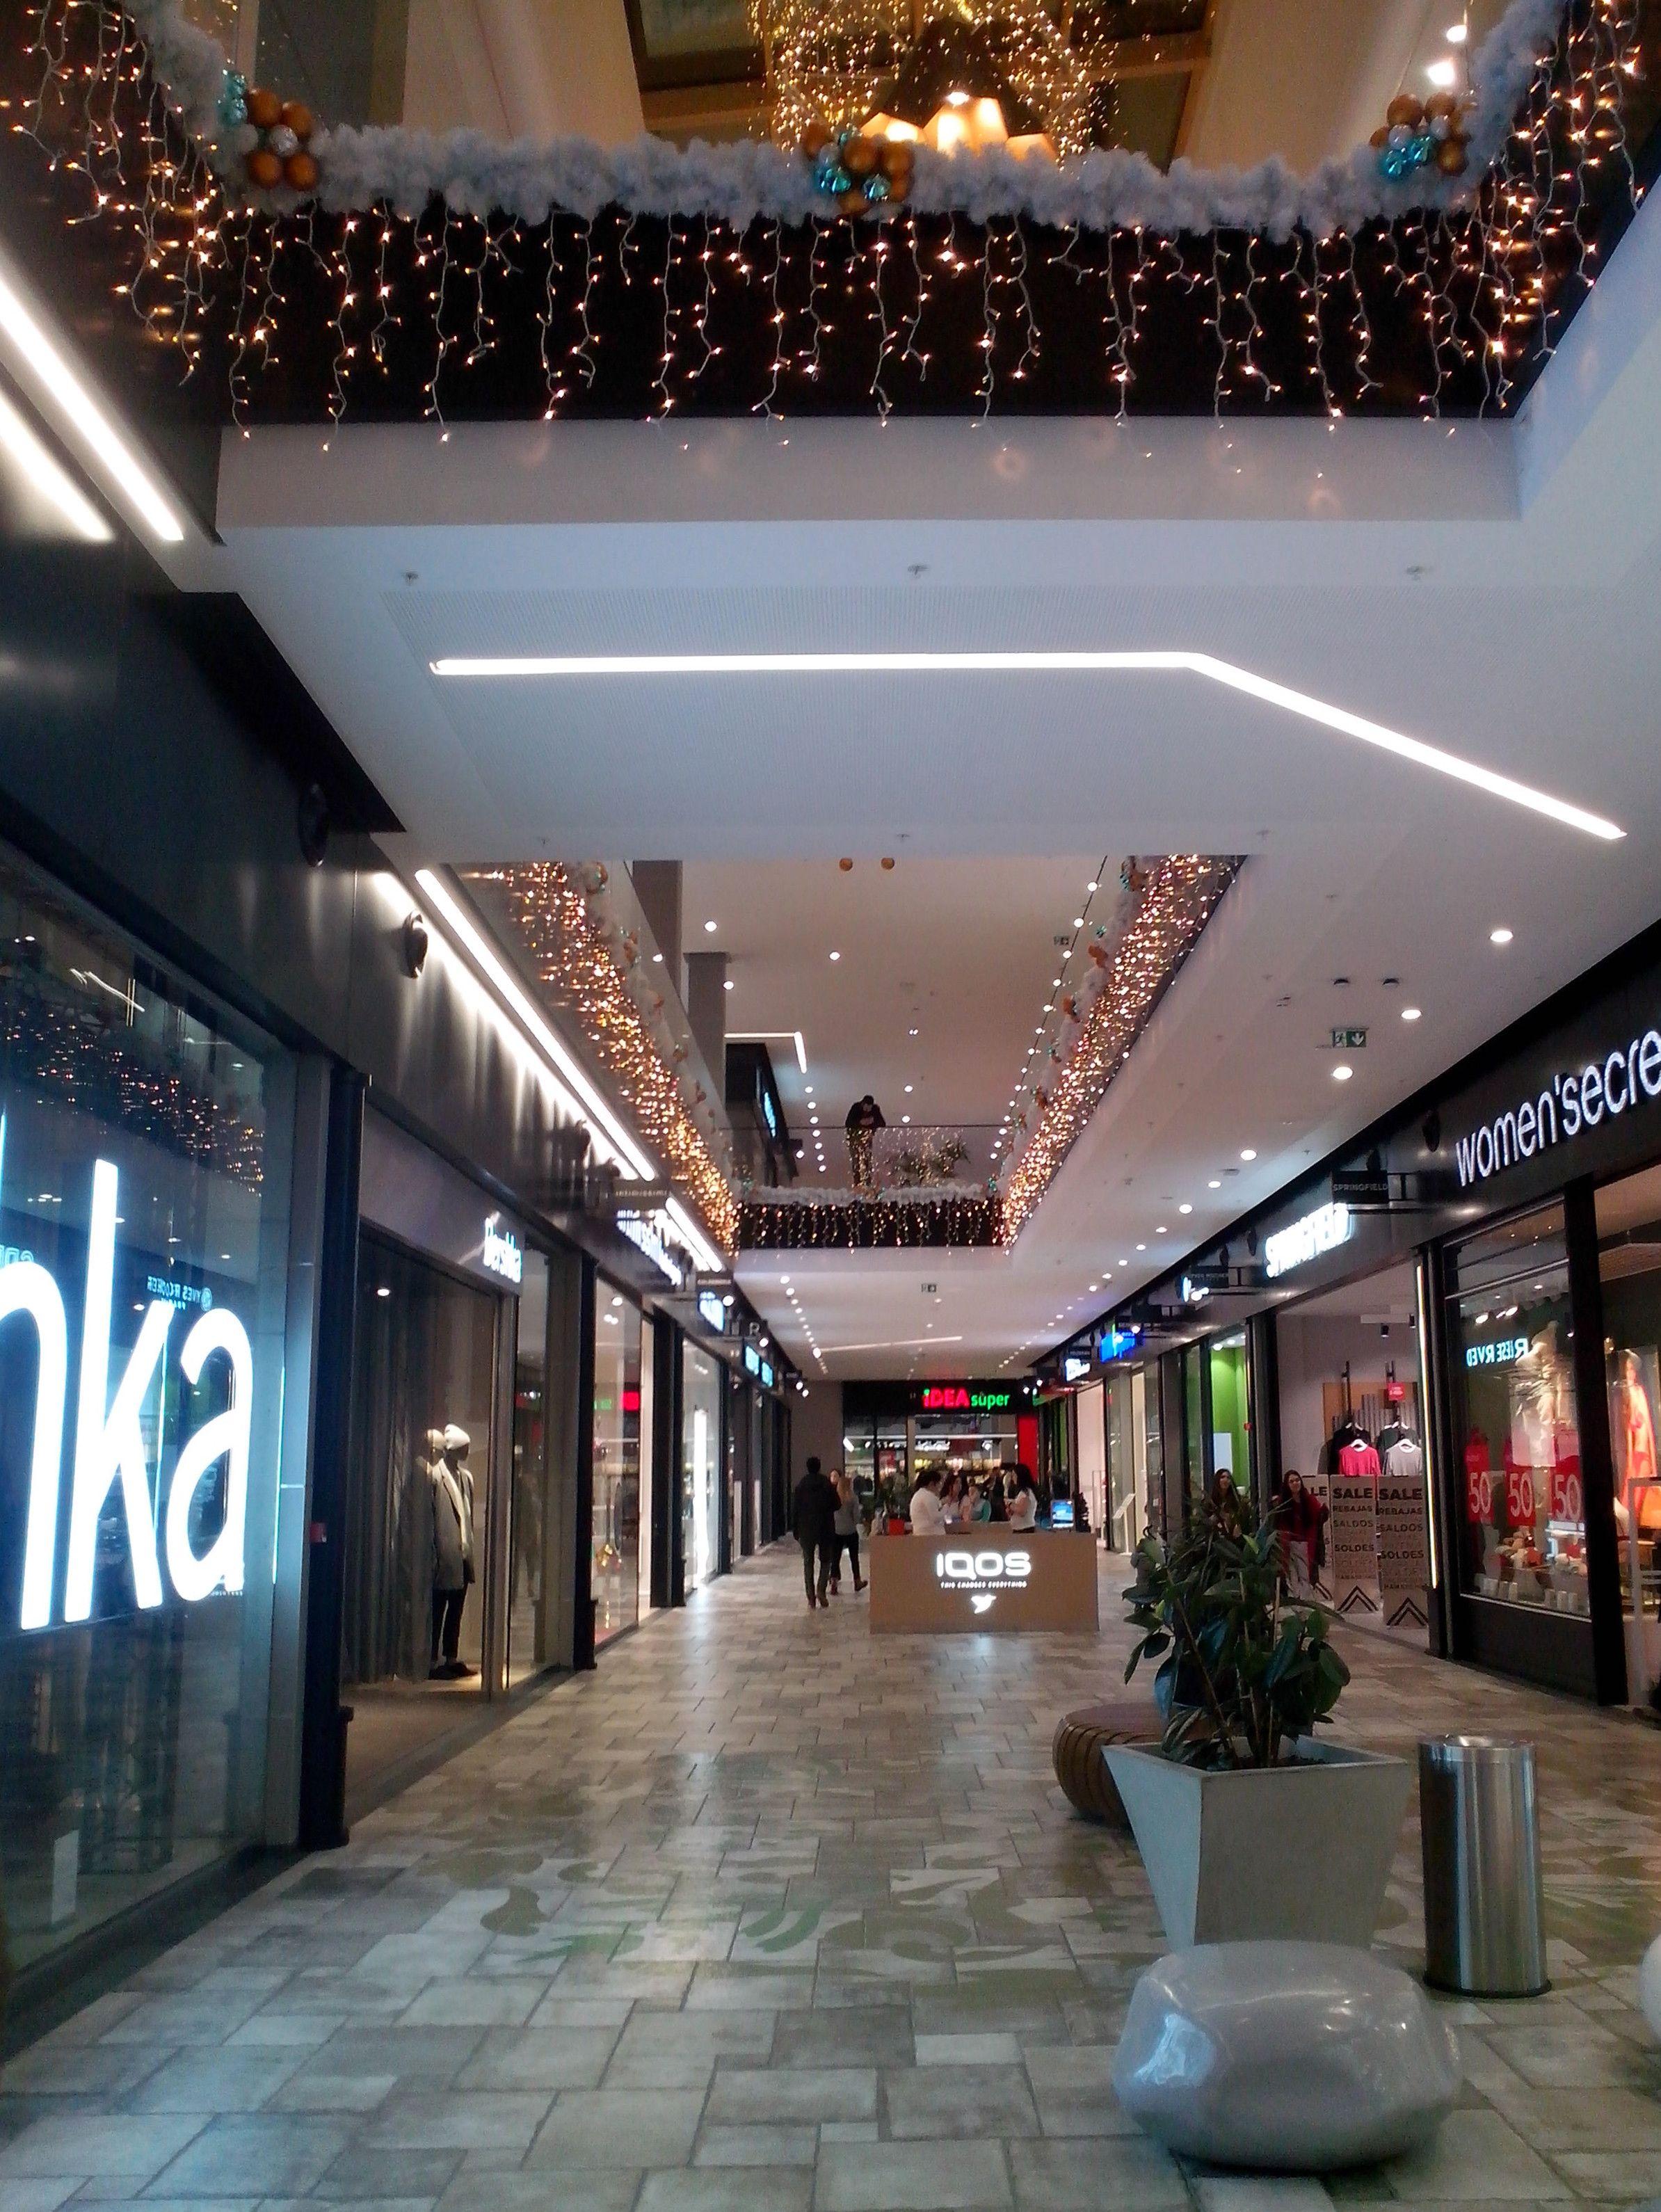 Shopping mall hallway in Belgrade, Serbia. Common area